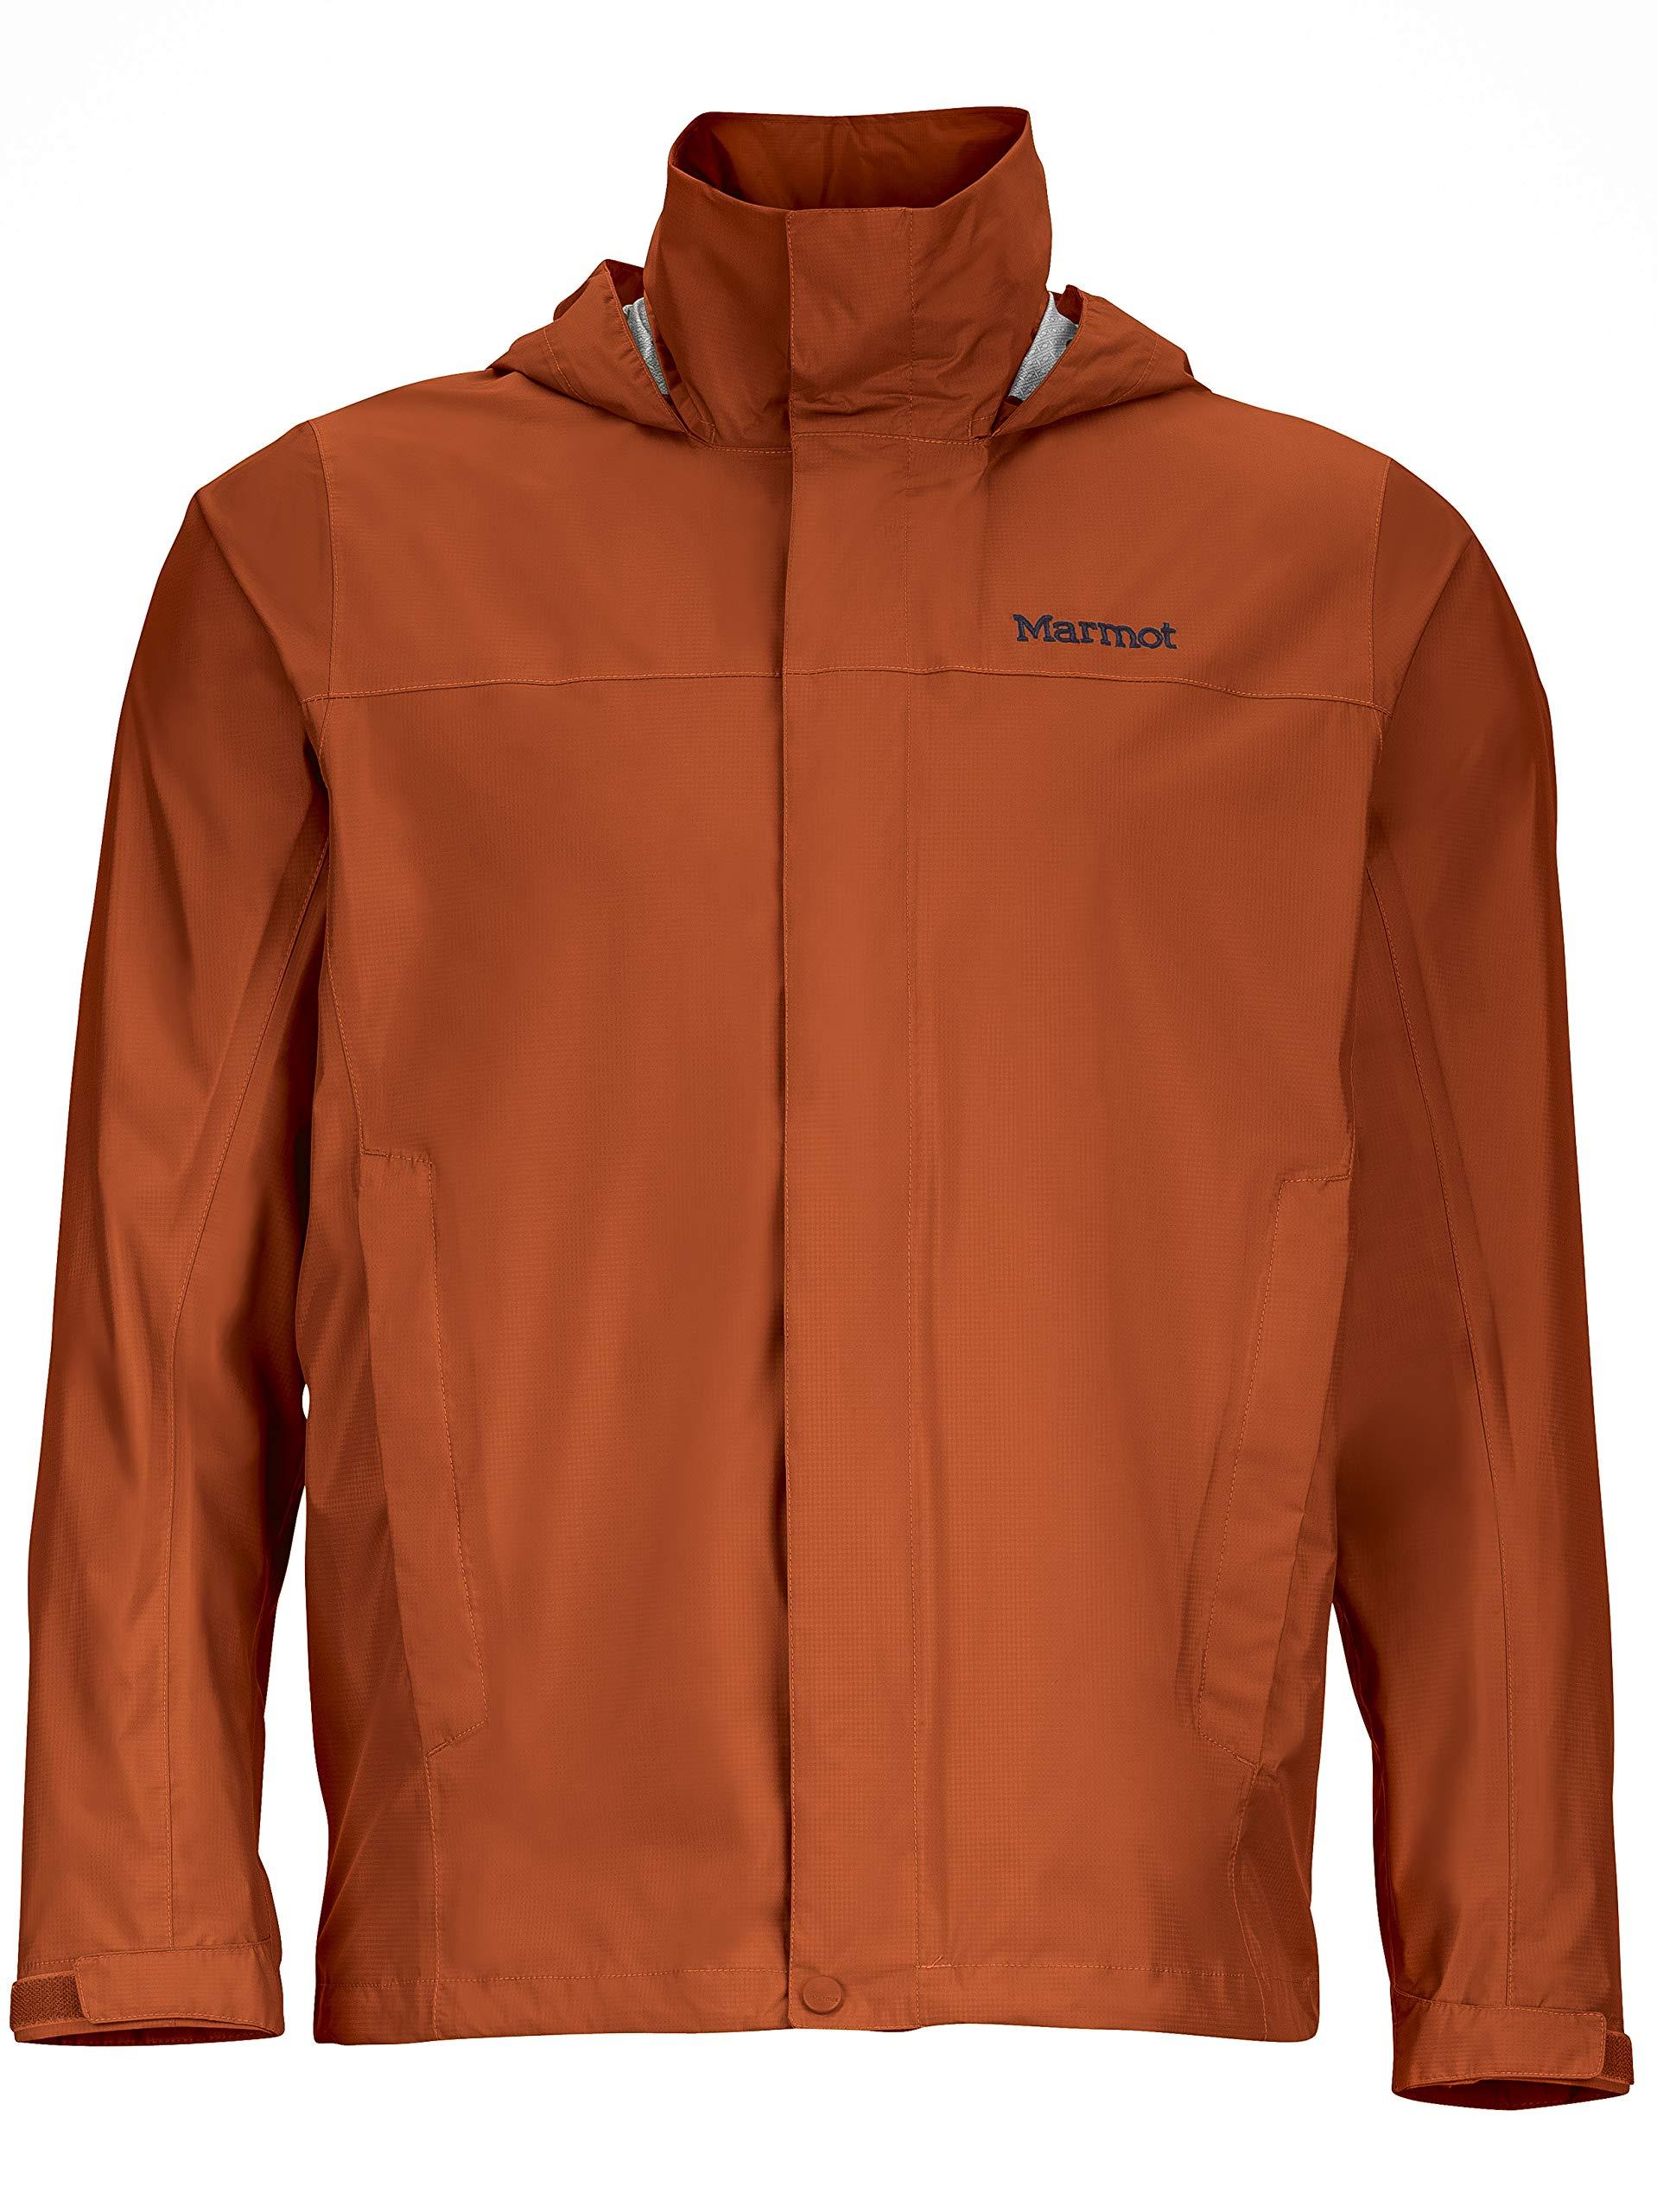 Marmot Men's PreCip Lightweight Waterproof Rain Jacket, Dark Rust, Small by Marmot